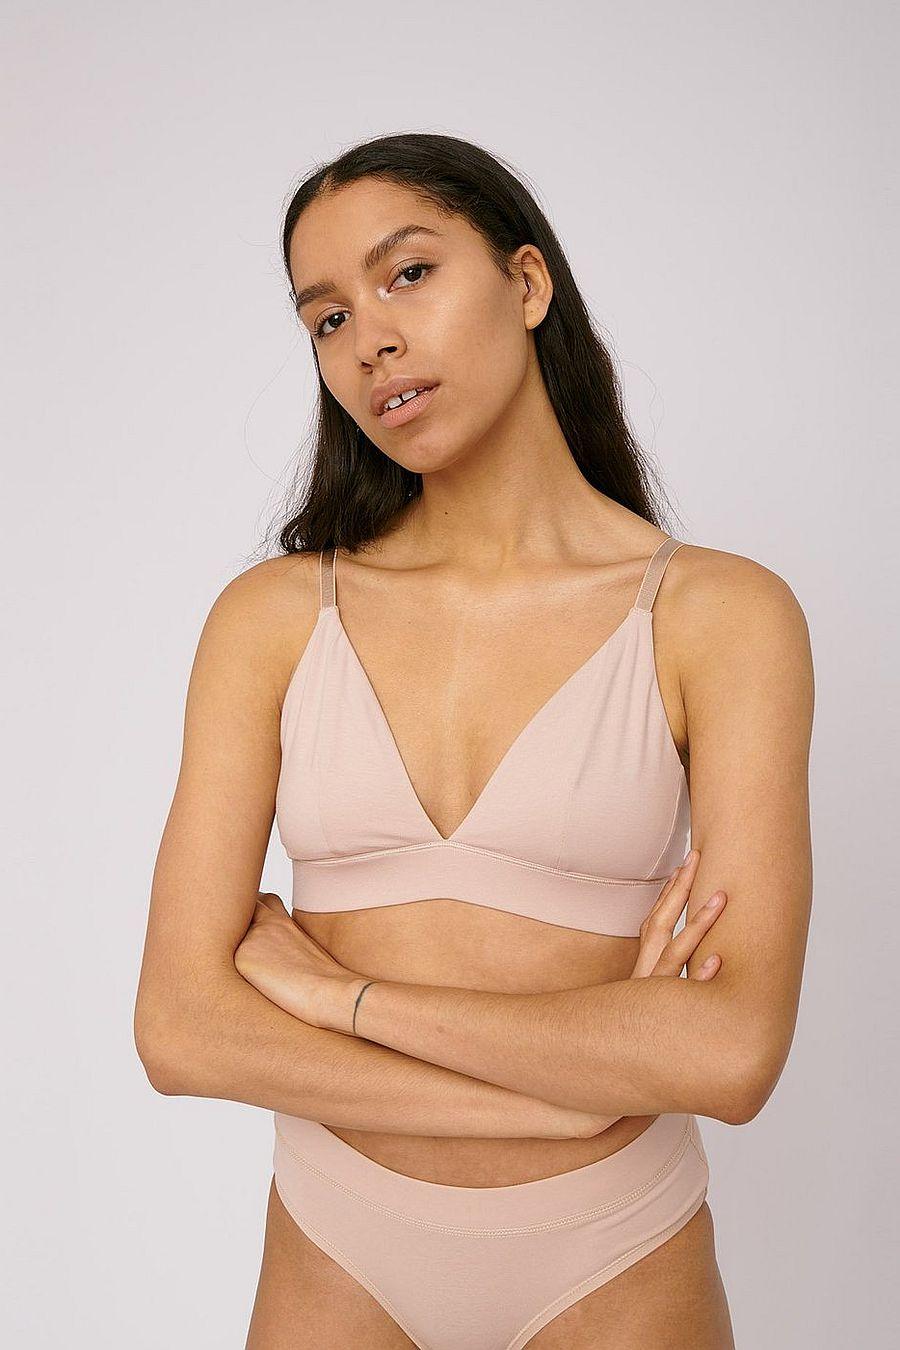 Organic Basics Organic Cotton Triangle Bra - Rose Nude